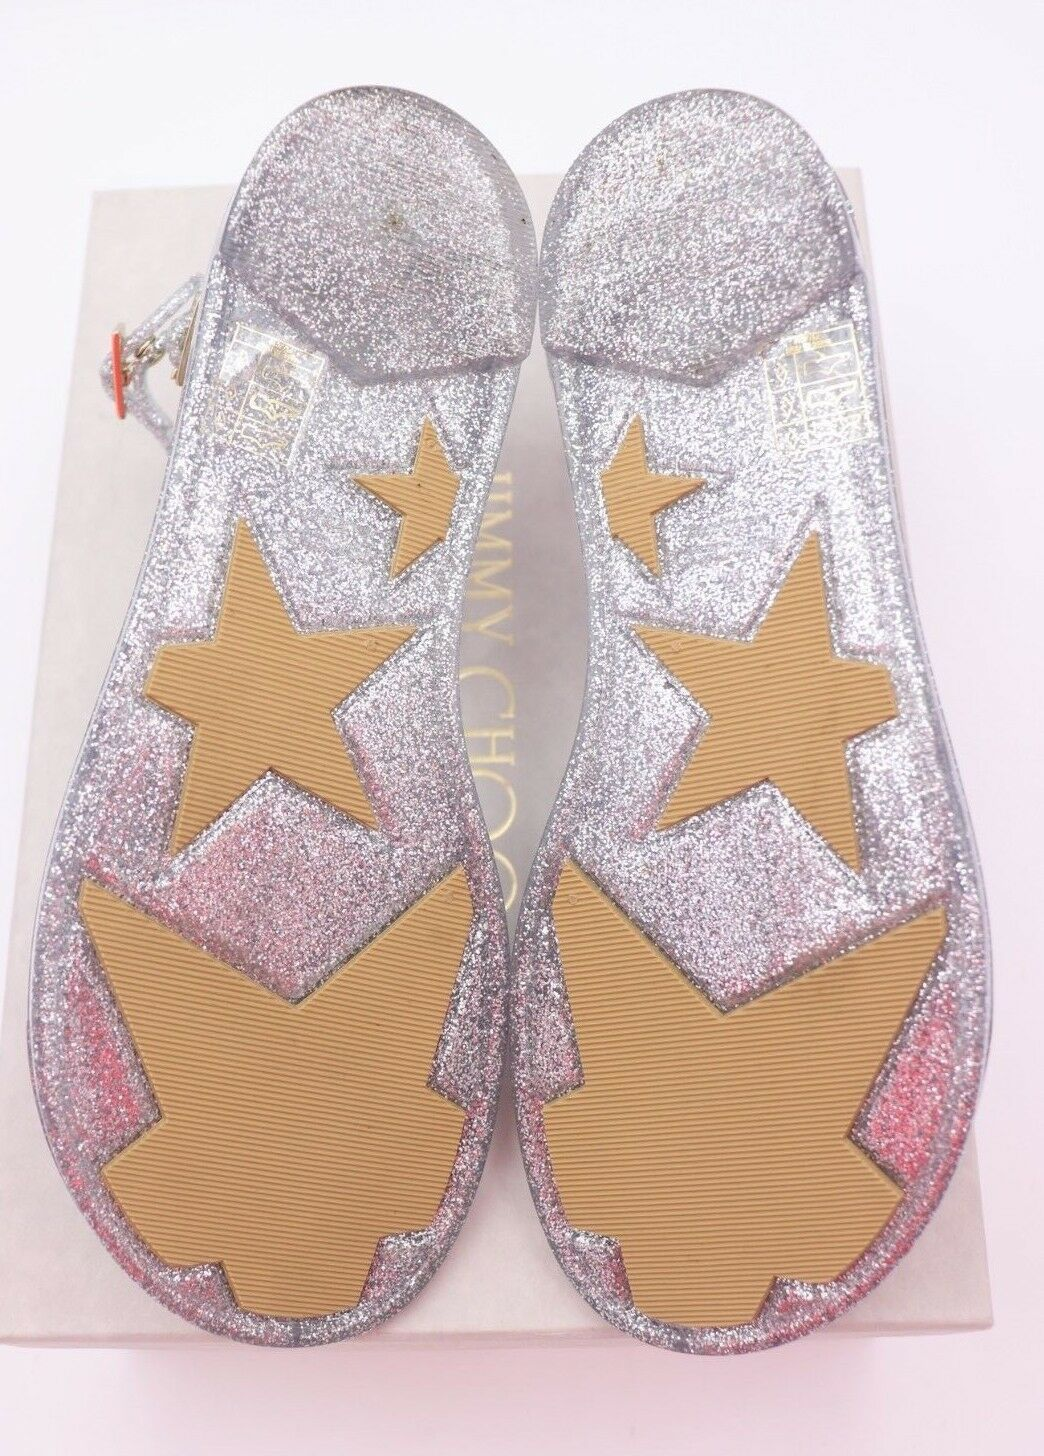 NIB Jimmy Choo Lance Silver Metallic Glitter Rubber Jelly Sandals 7 37 New image 7